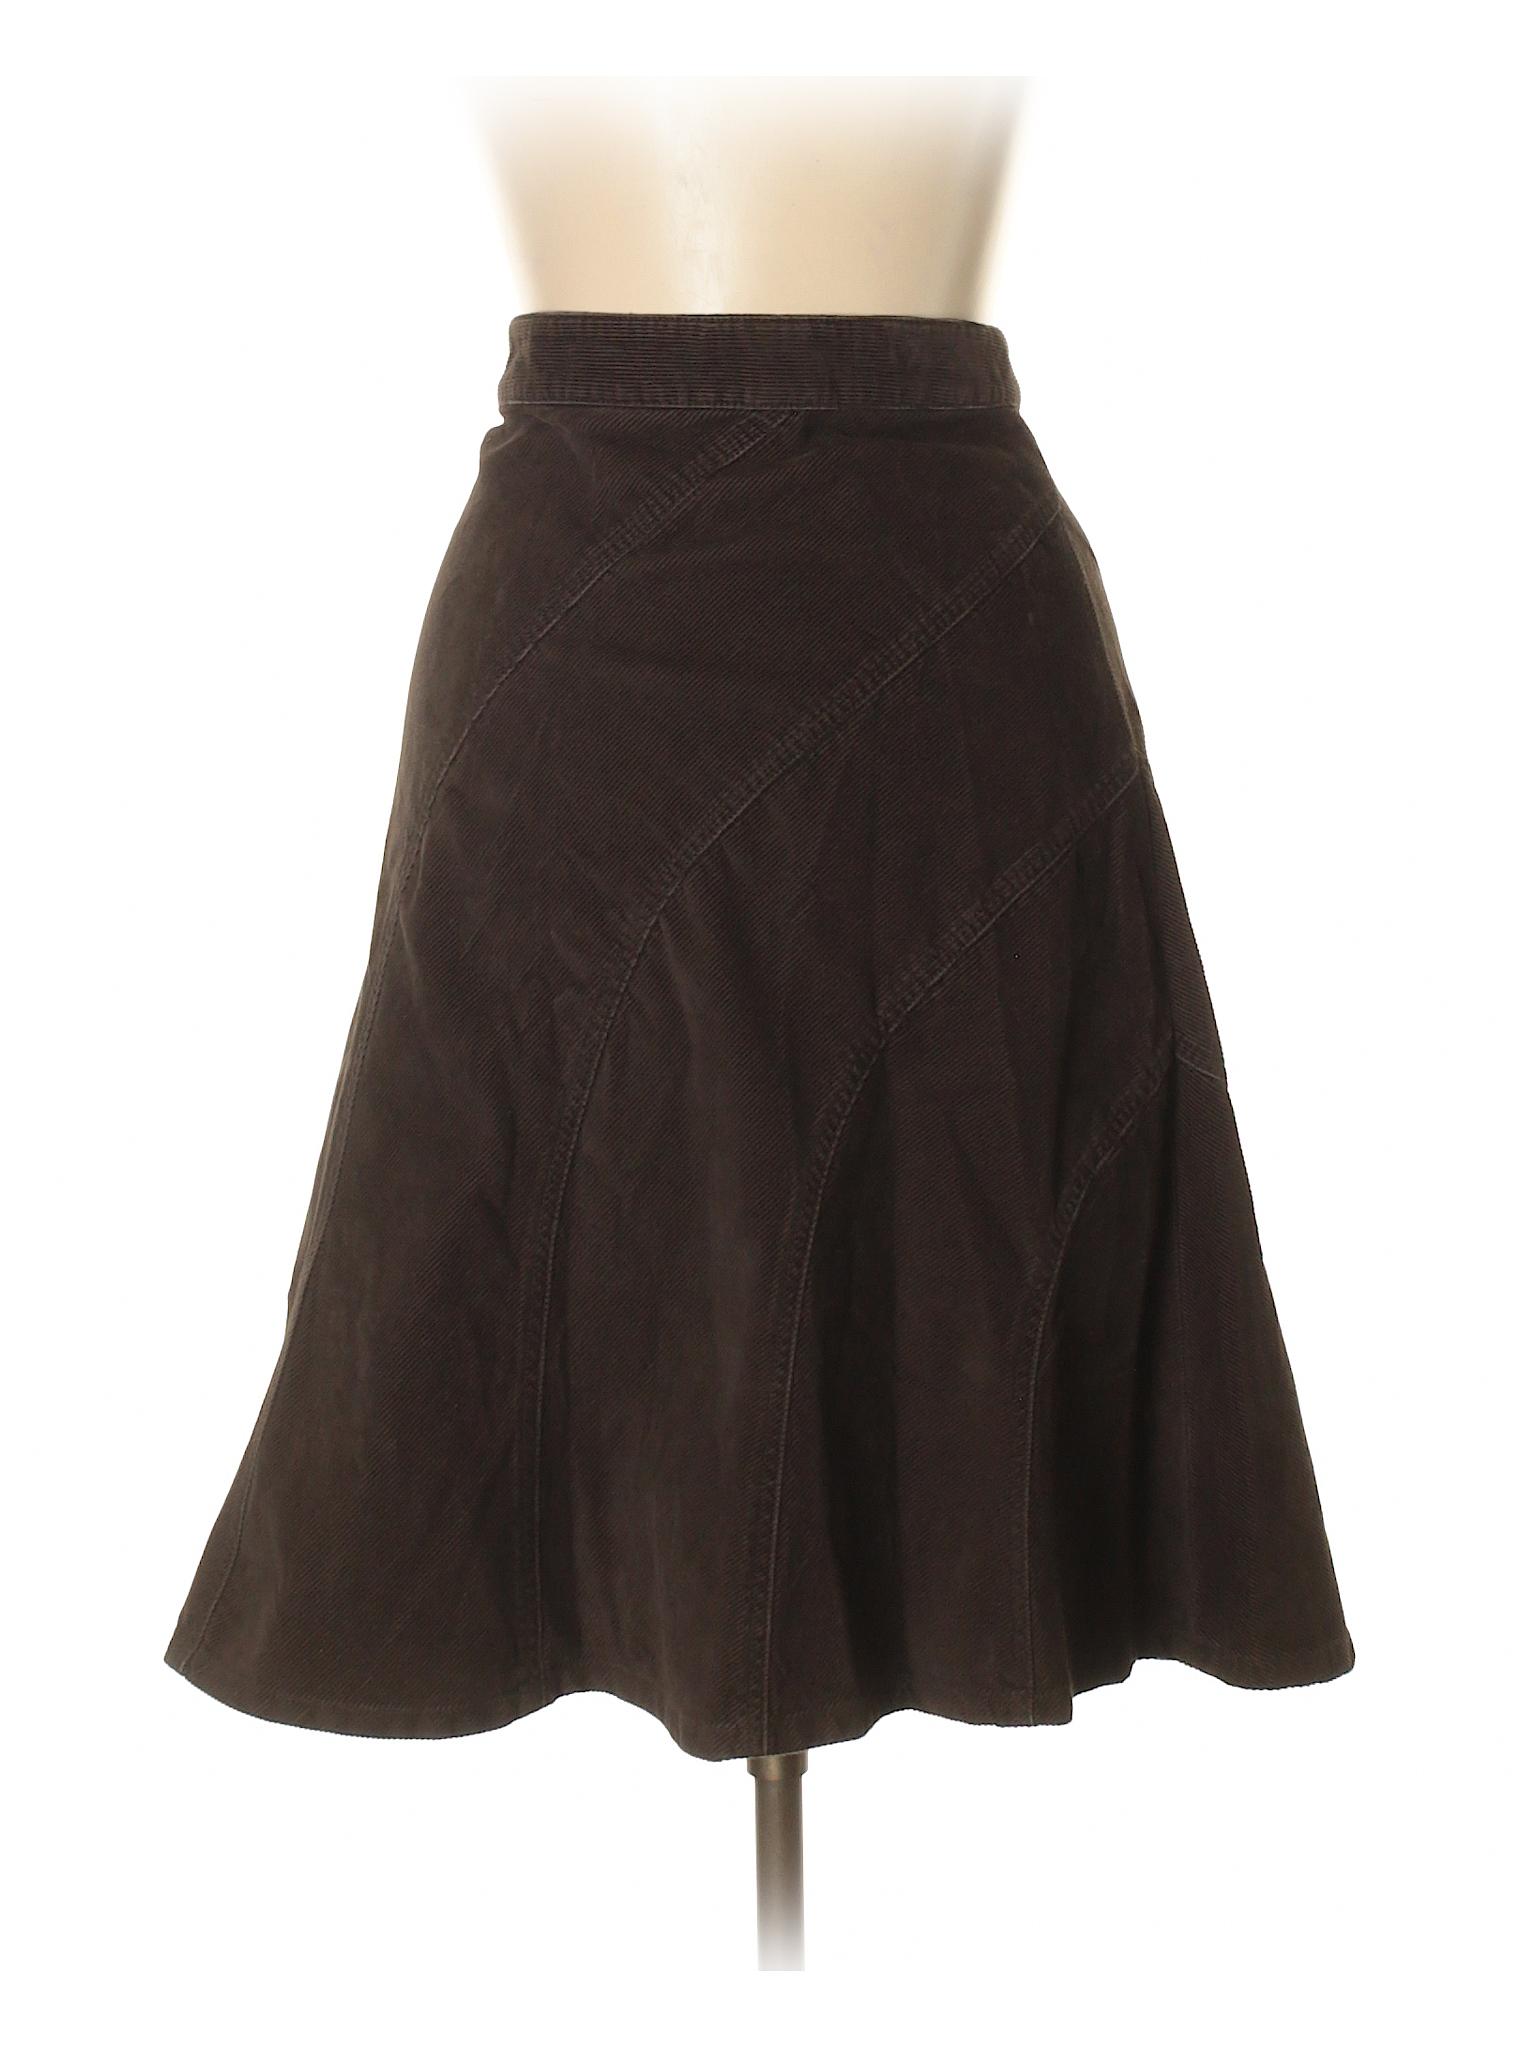 Leisure Casual Leisure winter DKNY Skirt Skirt Leisure DKNY DKNY winter Casual winter a7TqCOO